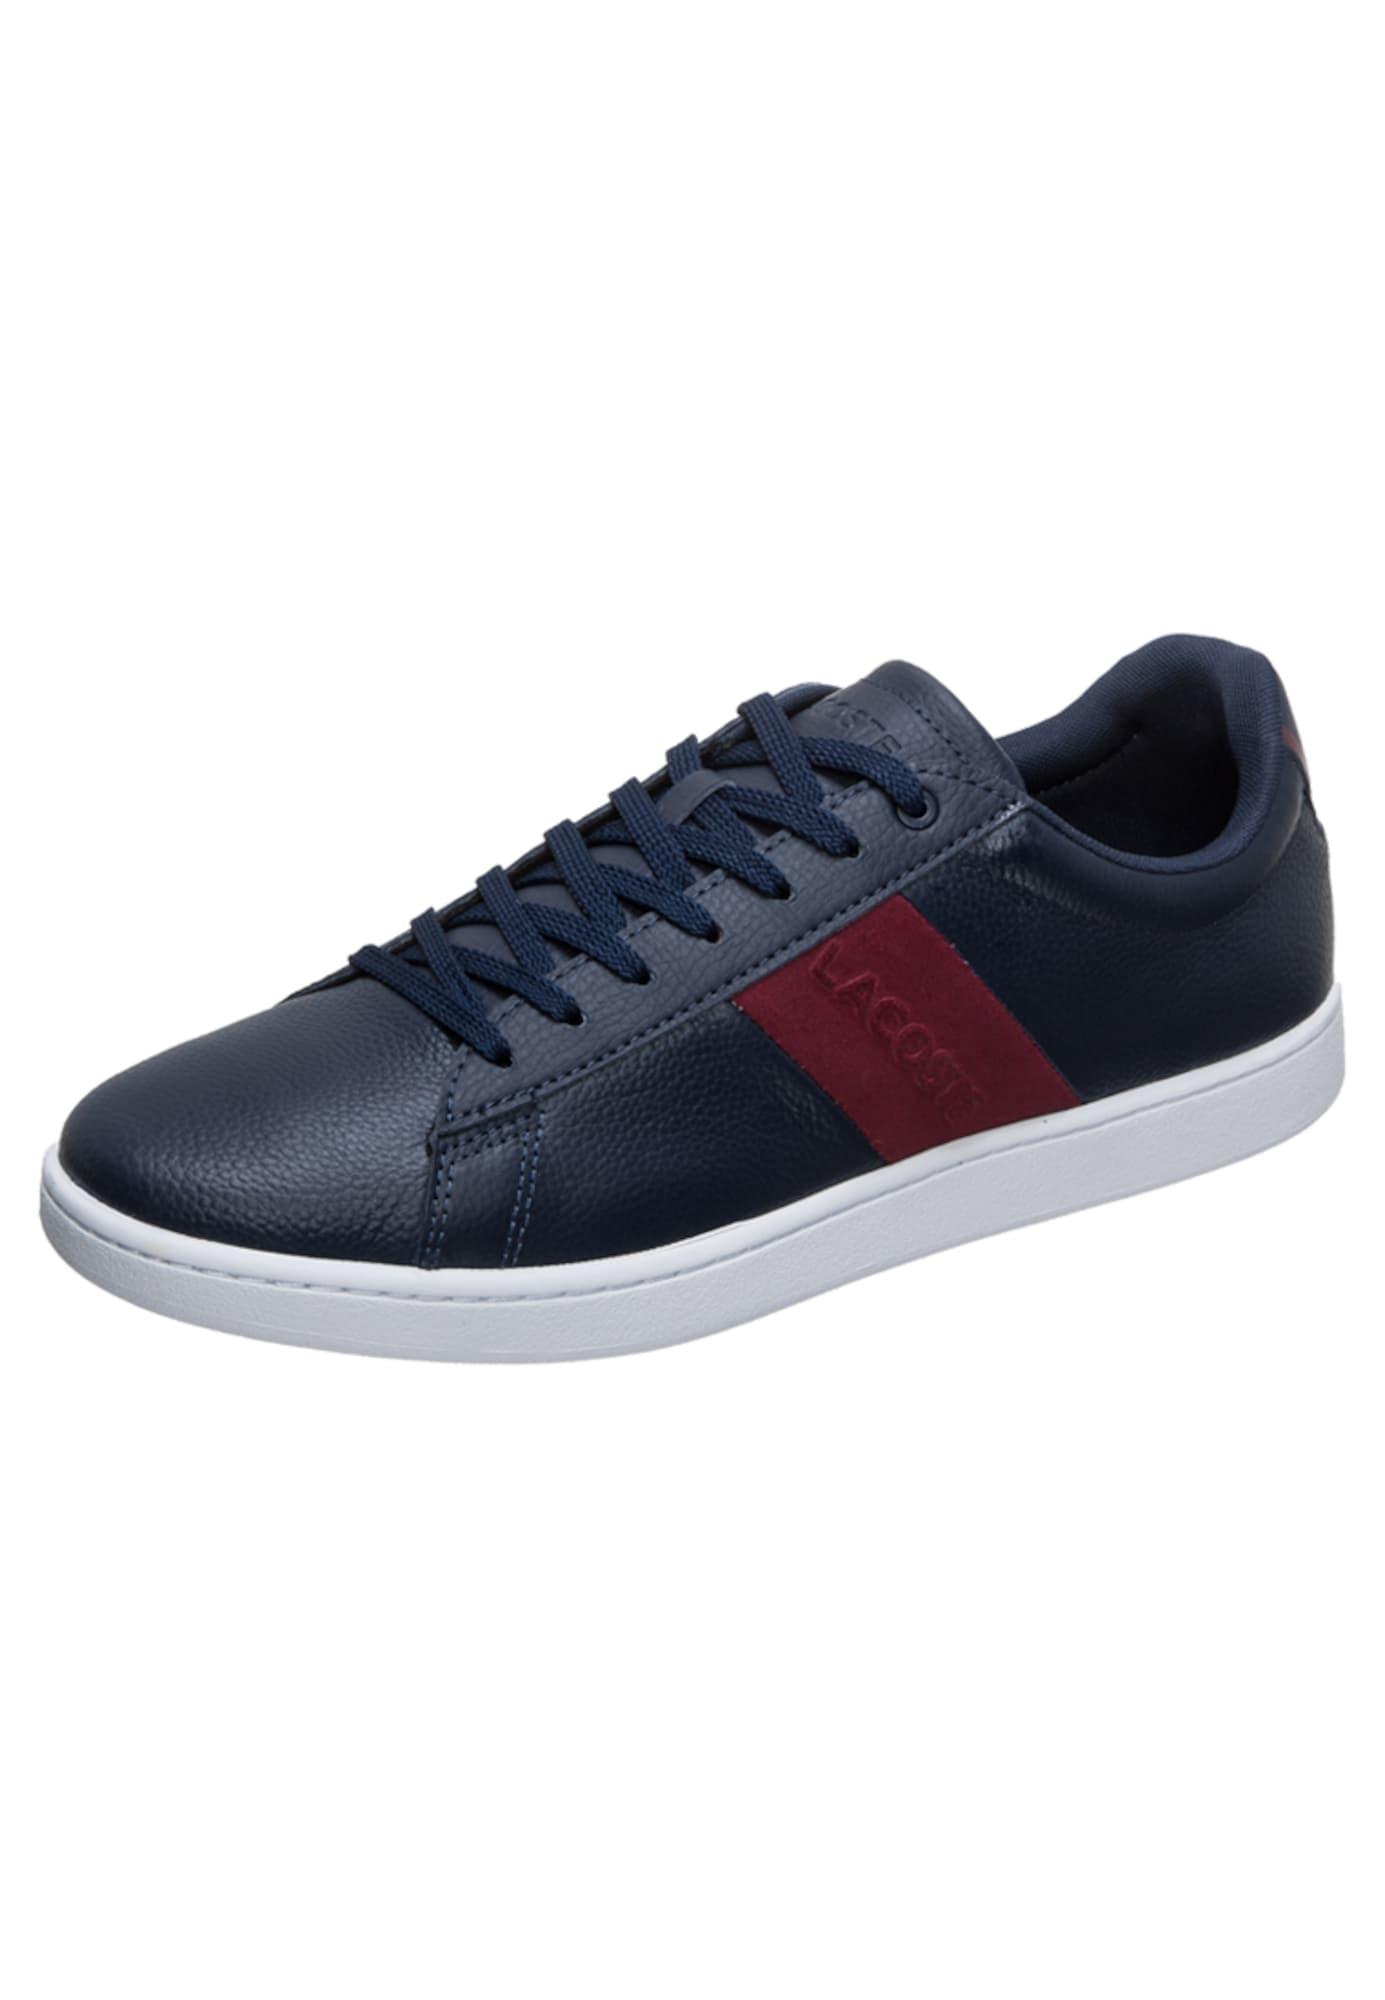 Herren Lacoste Sneaker blau,  rot,  violet, bunt,  mehrfarbig | 05012123429502